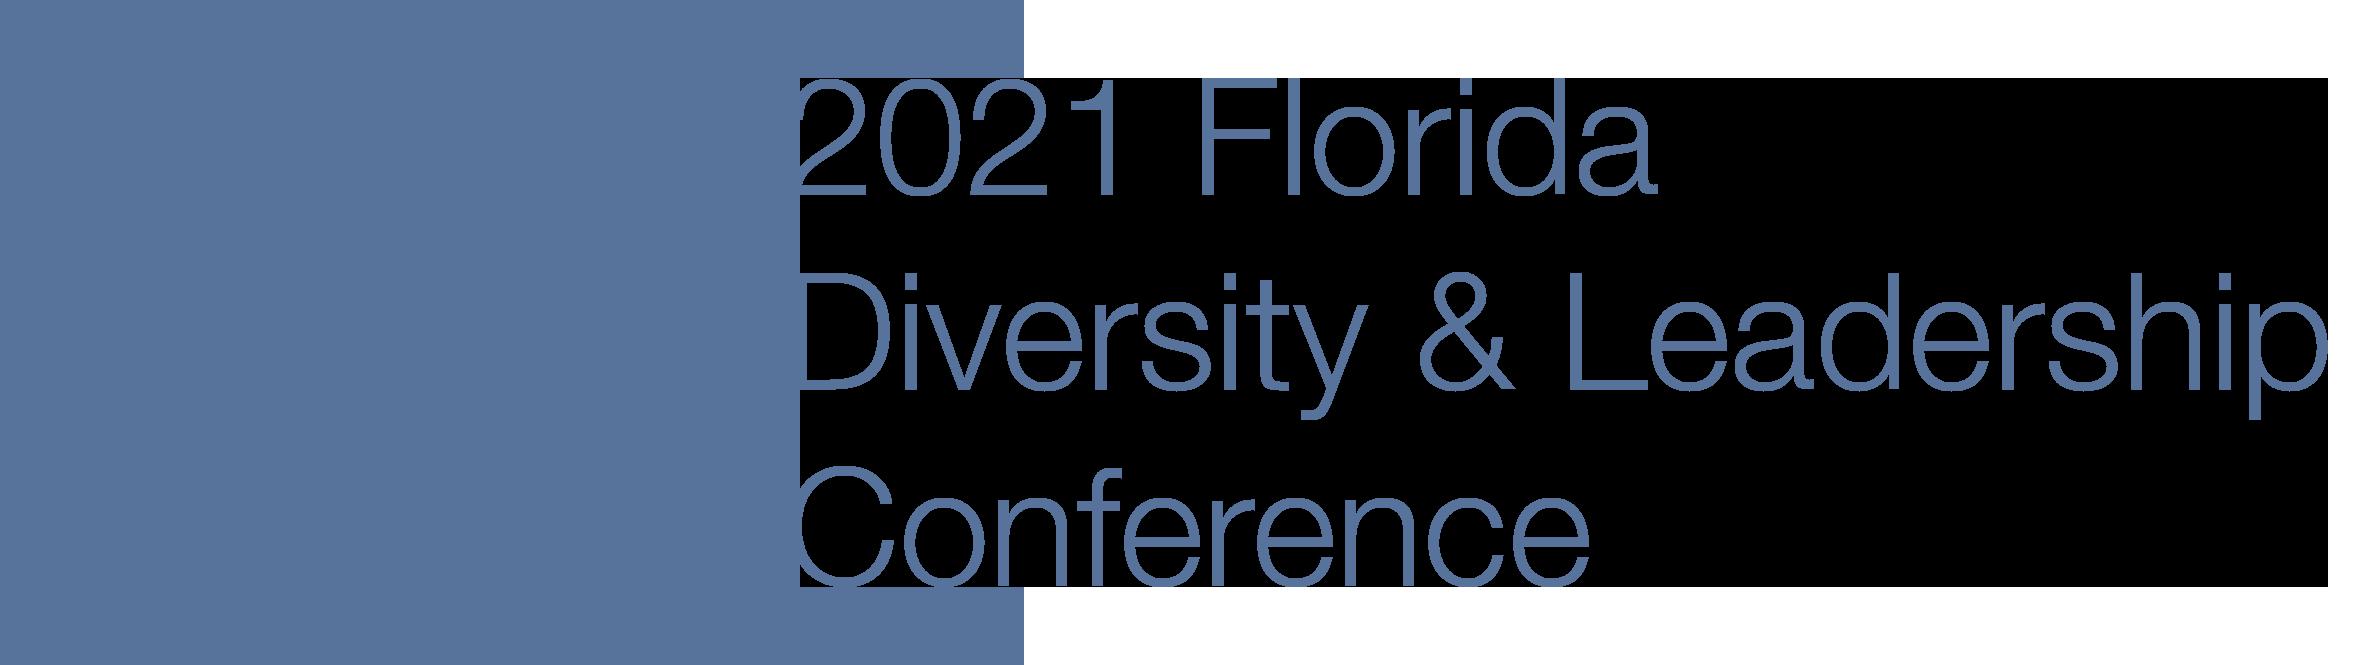 2021 9th Annual Florida Diversity & Leadership Conference (Virtual)